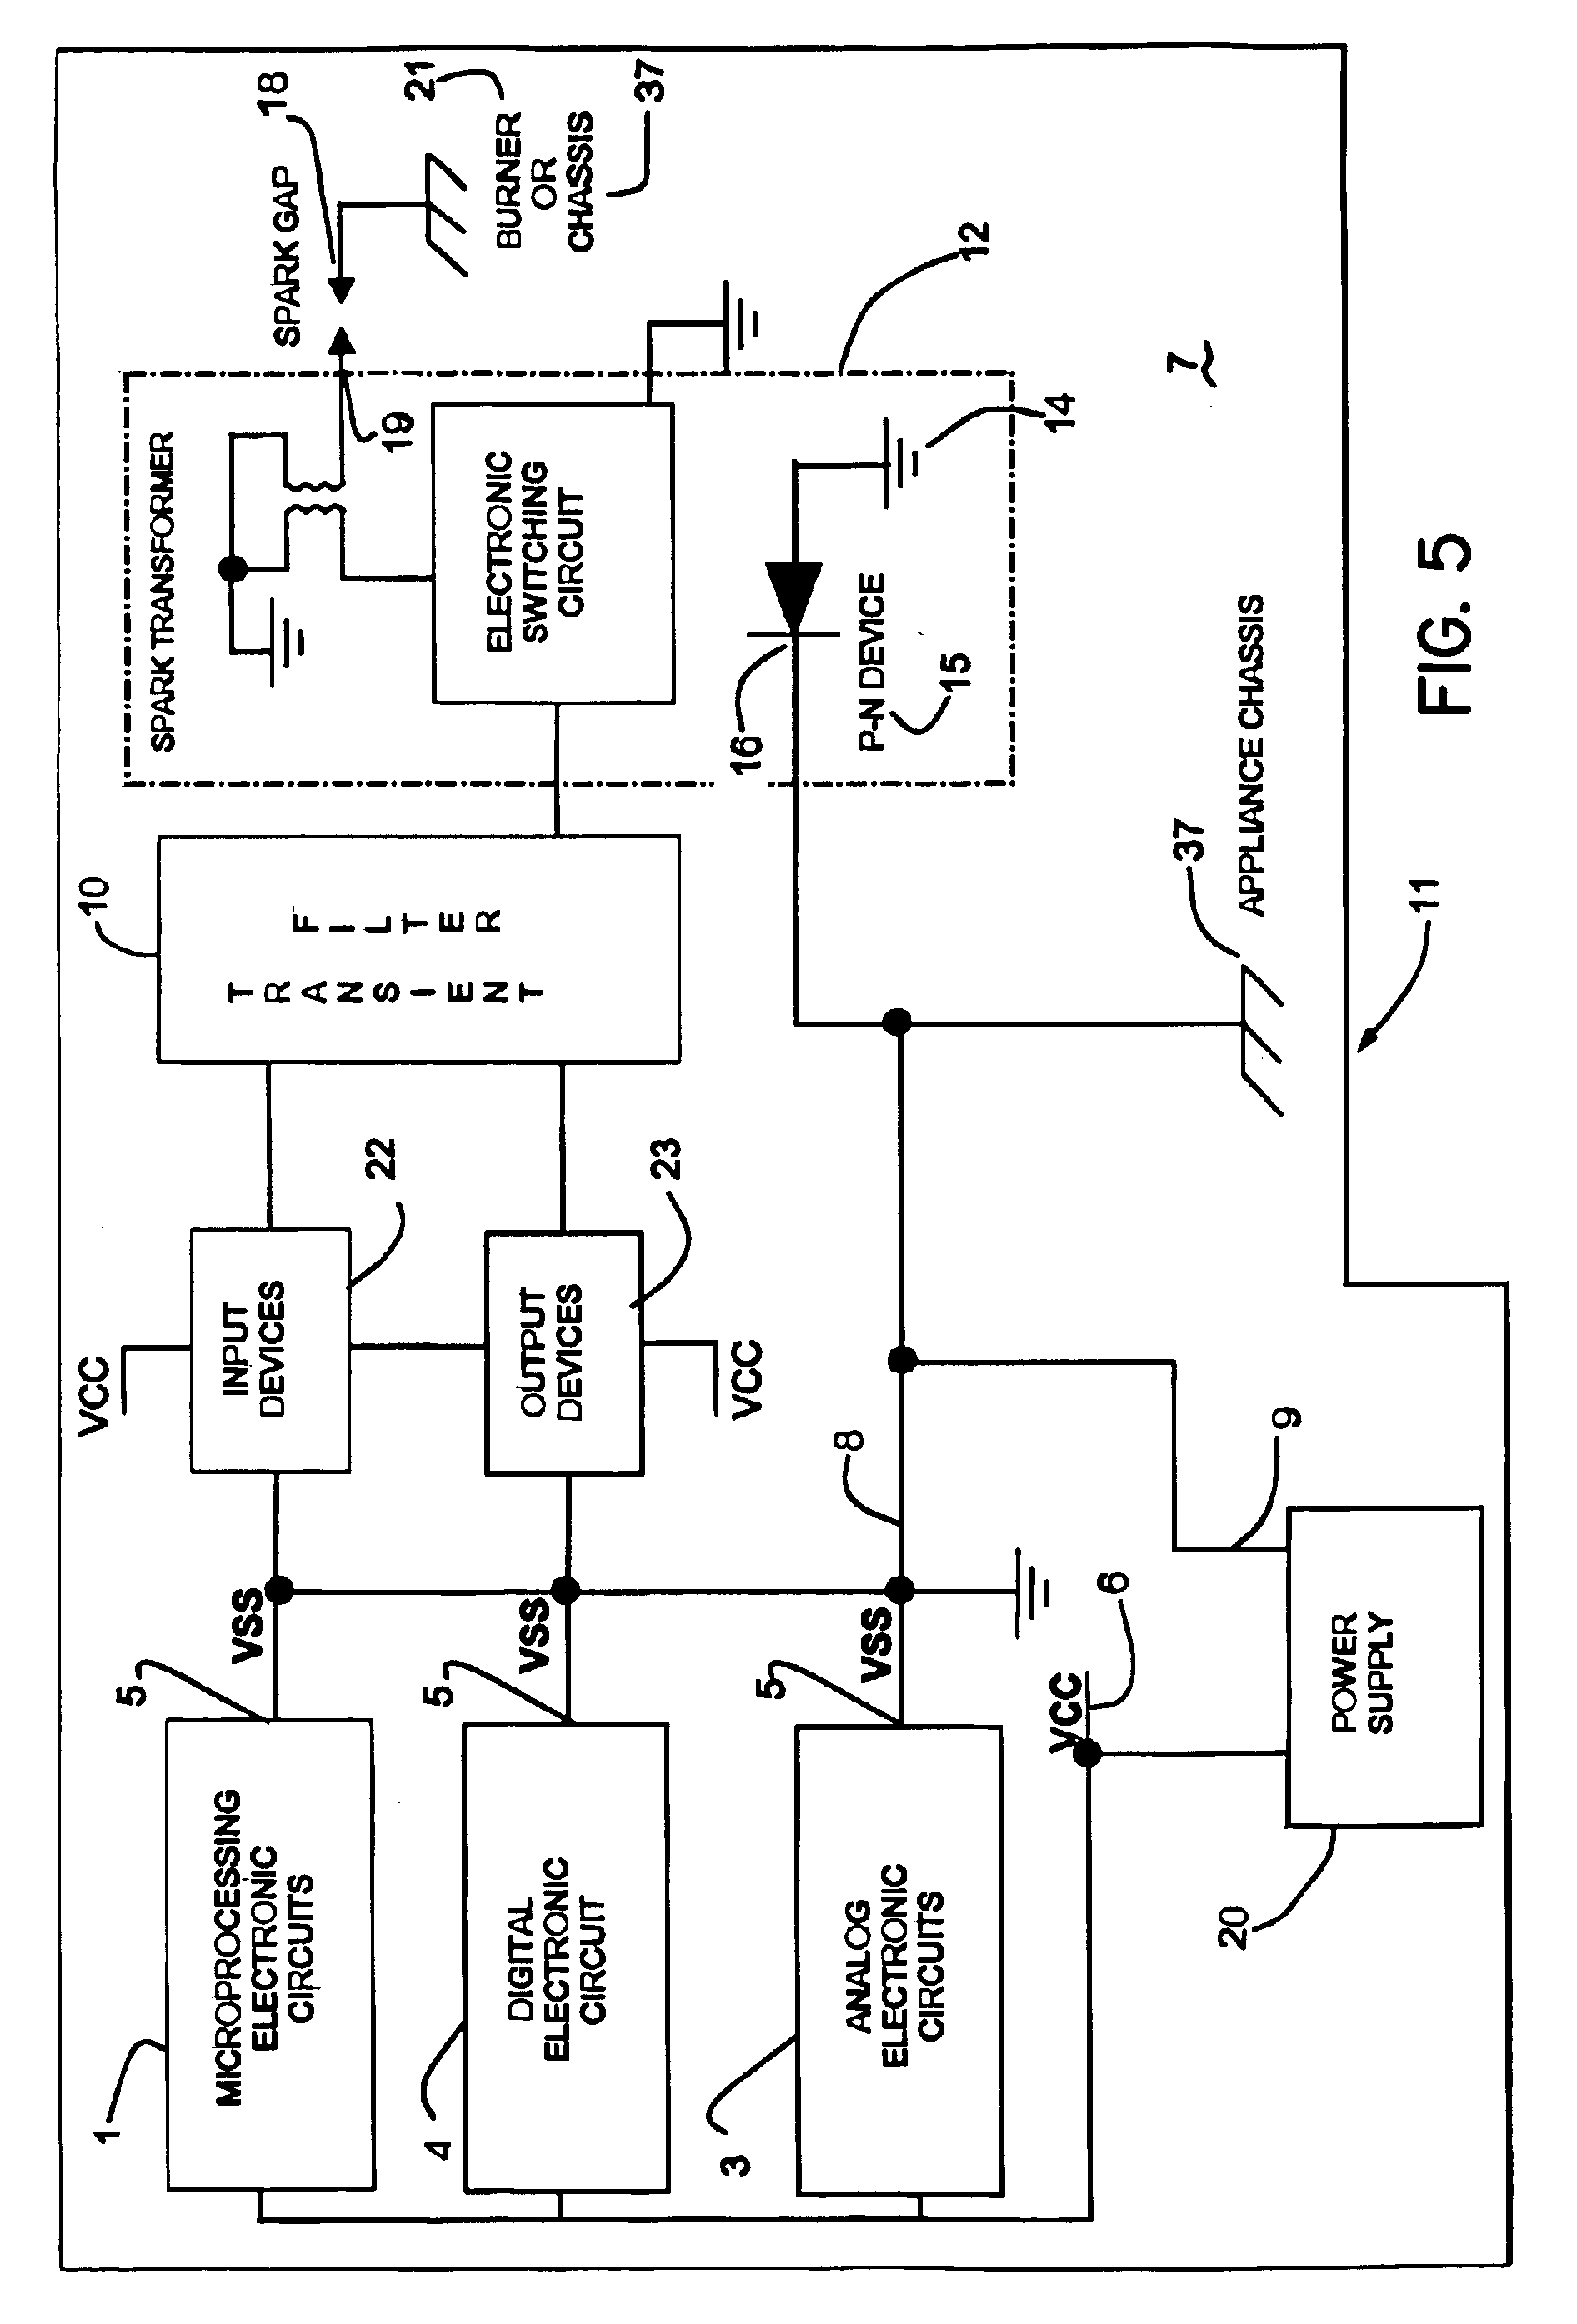 Rheem electric hot water heater wiring diagram the best wiring gas geyser wiring diagram how to electric hot water heater pooptronica